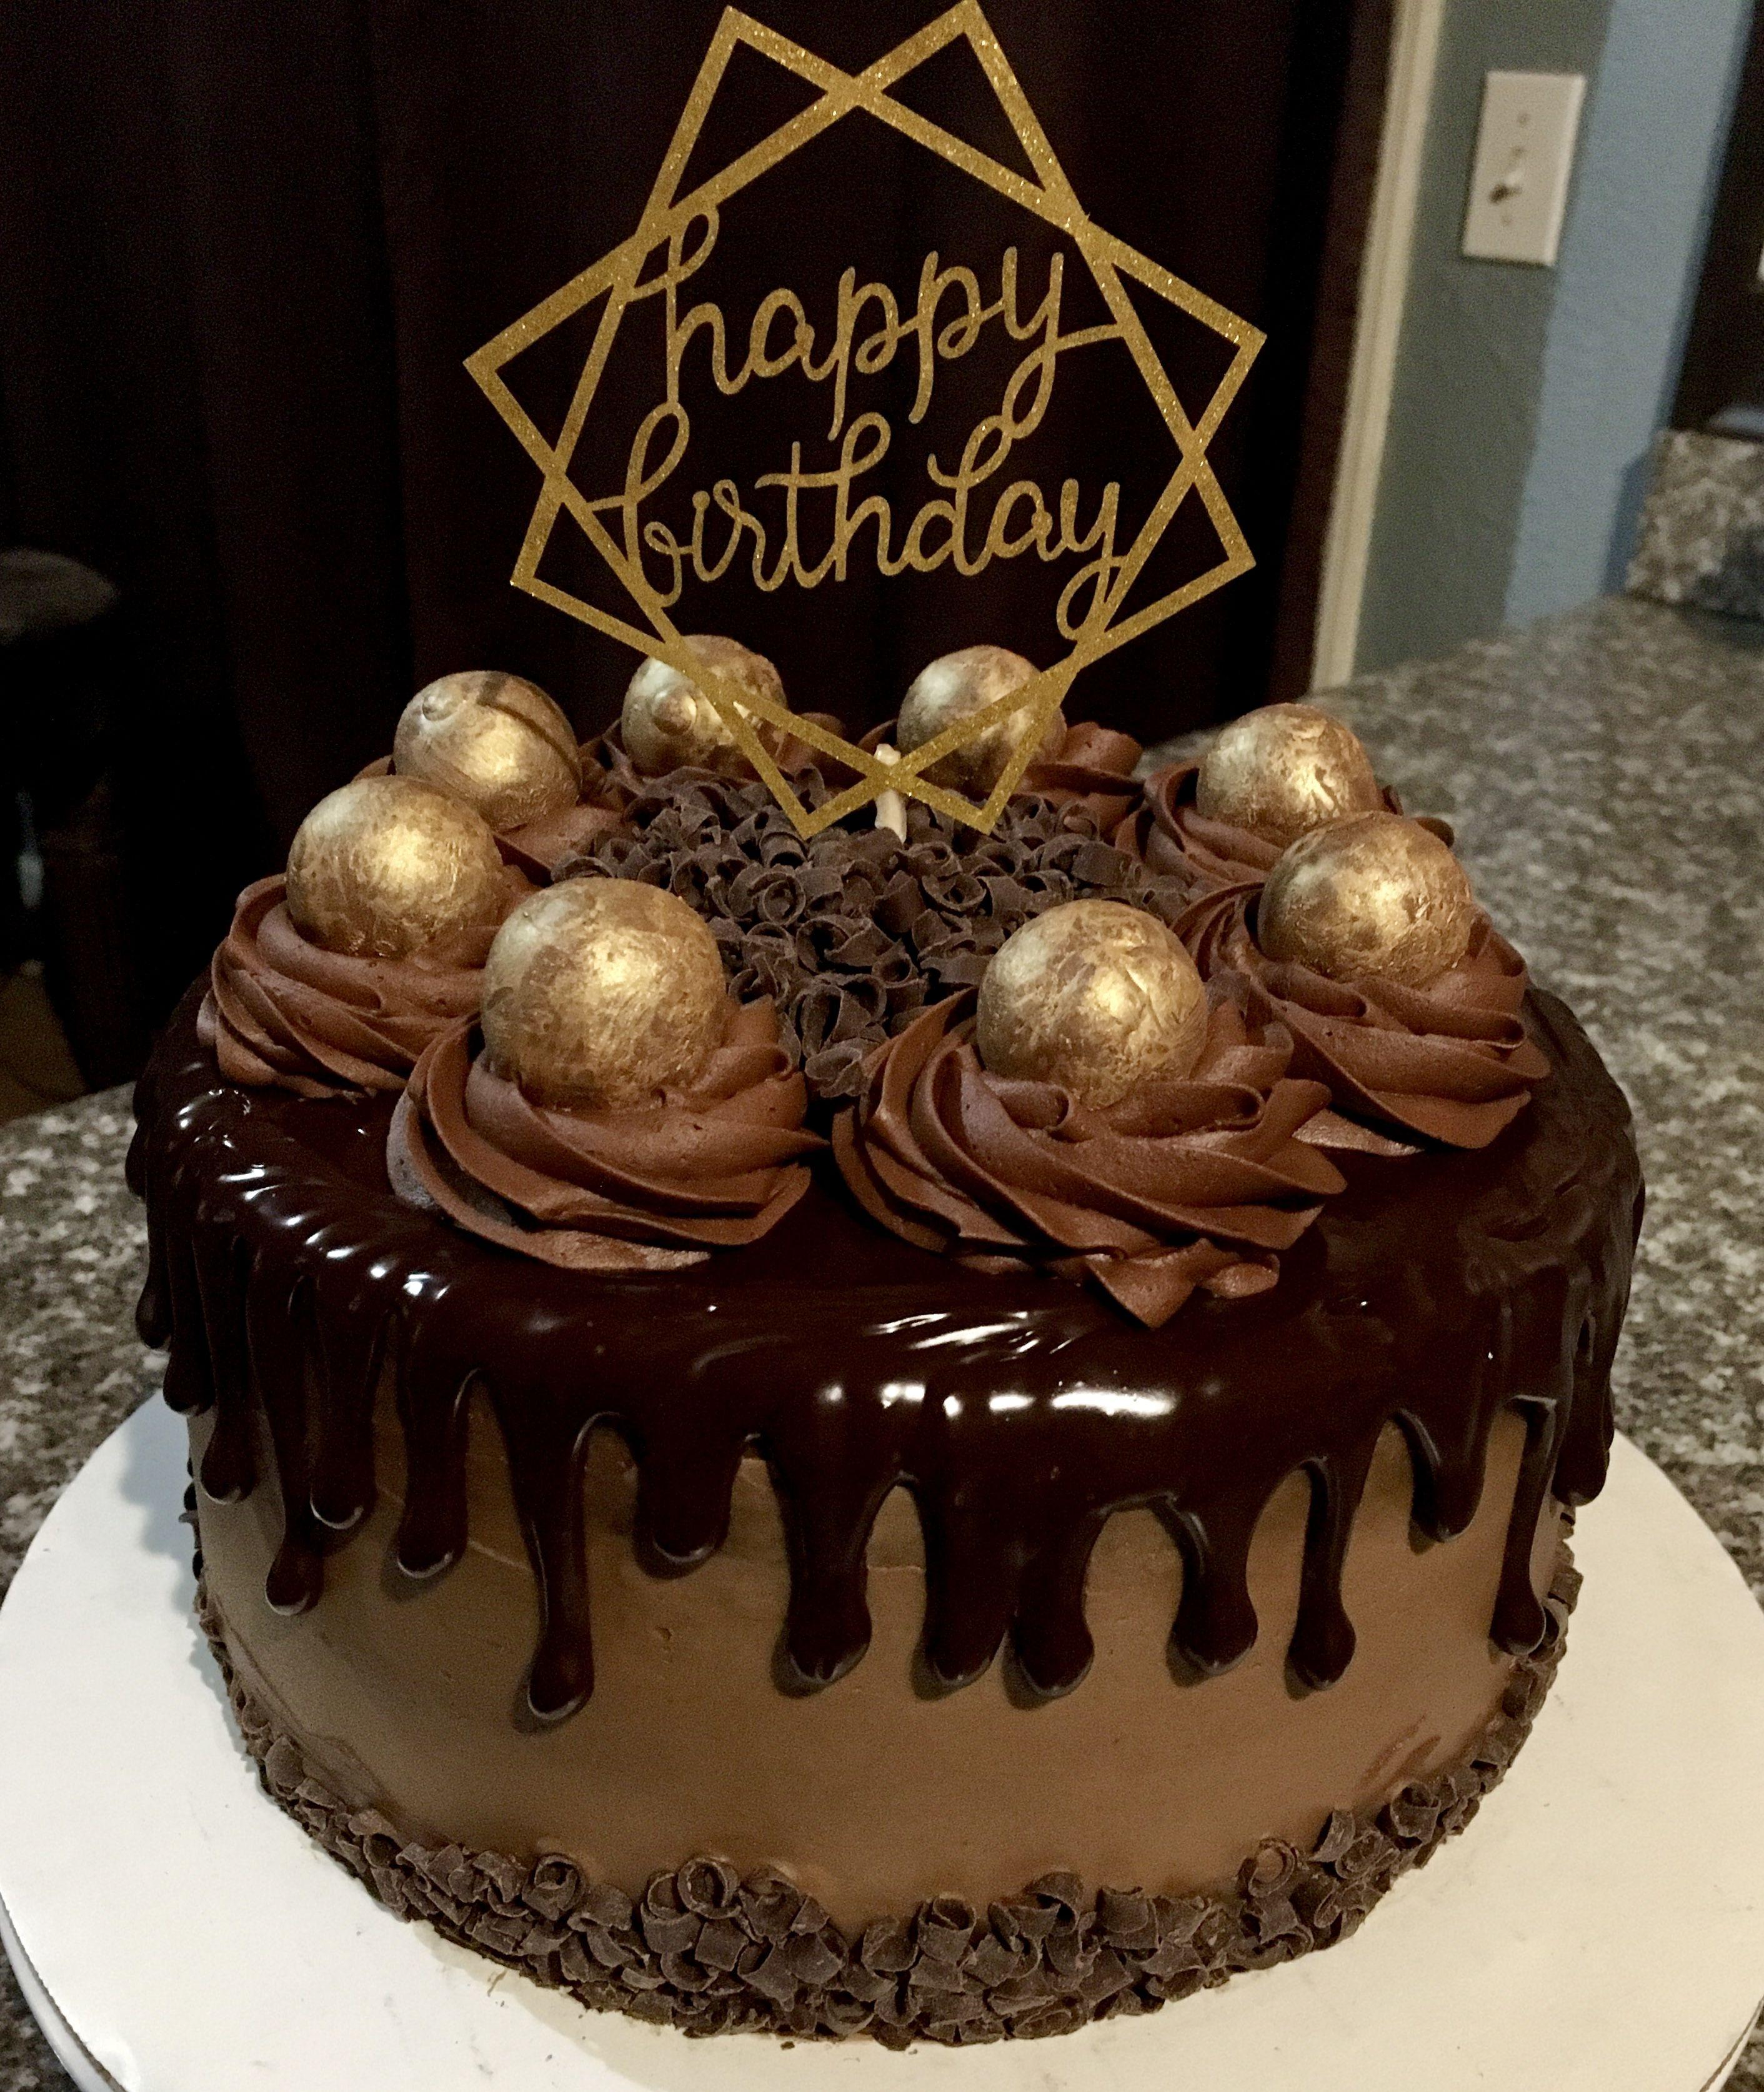 Chocolate Truffle Cake Birthday Cake With Candles Chocolate Truffle Cake Cake